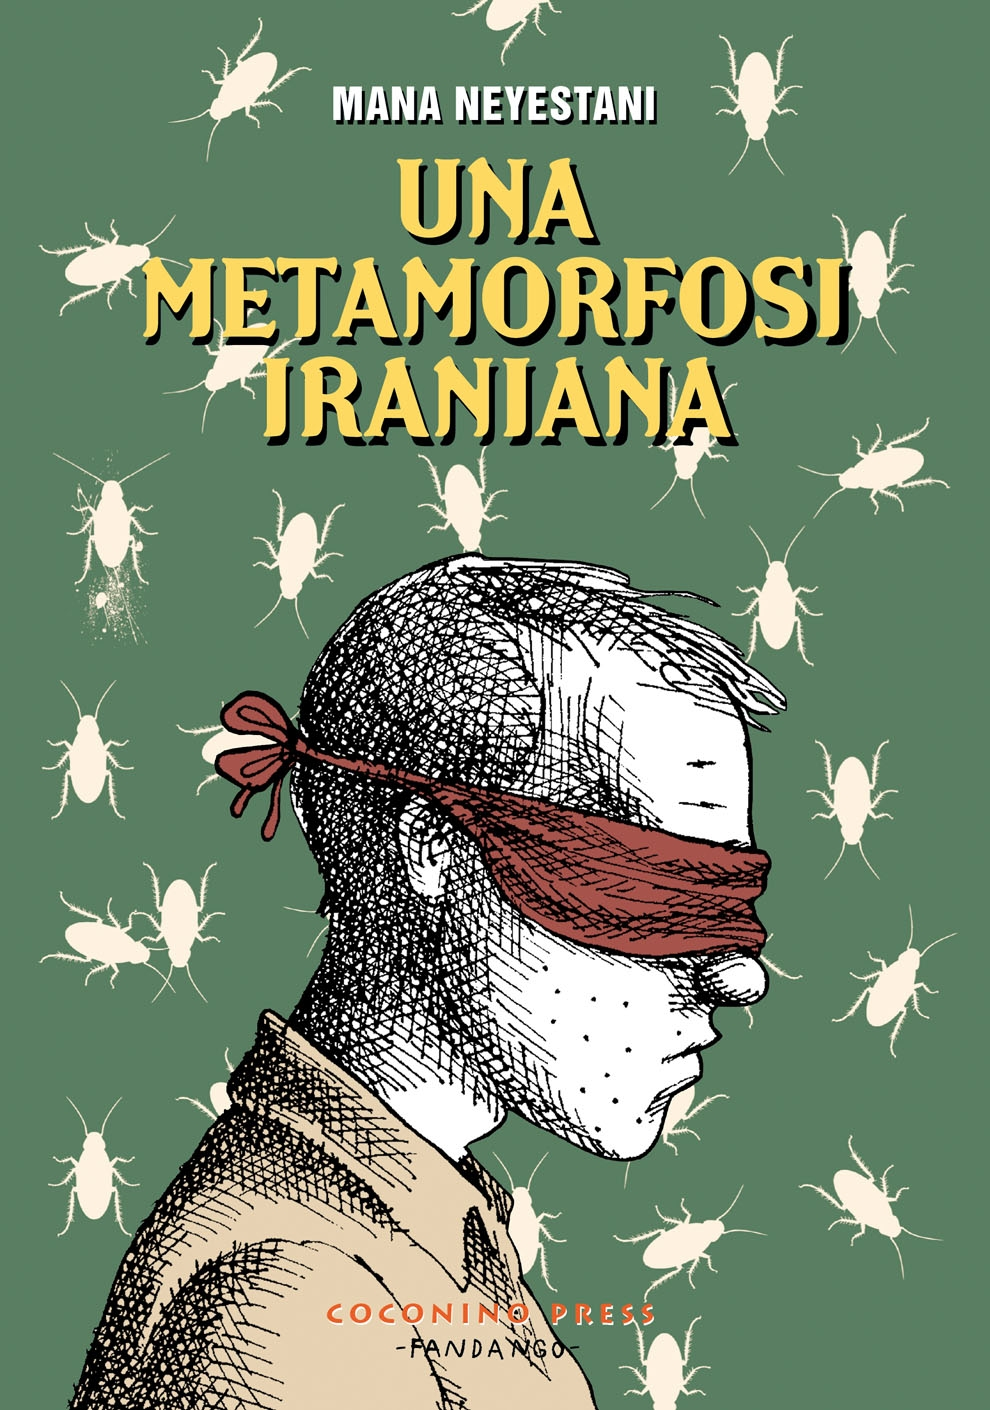 metamorfosi iraniana